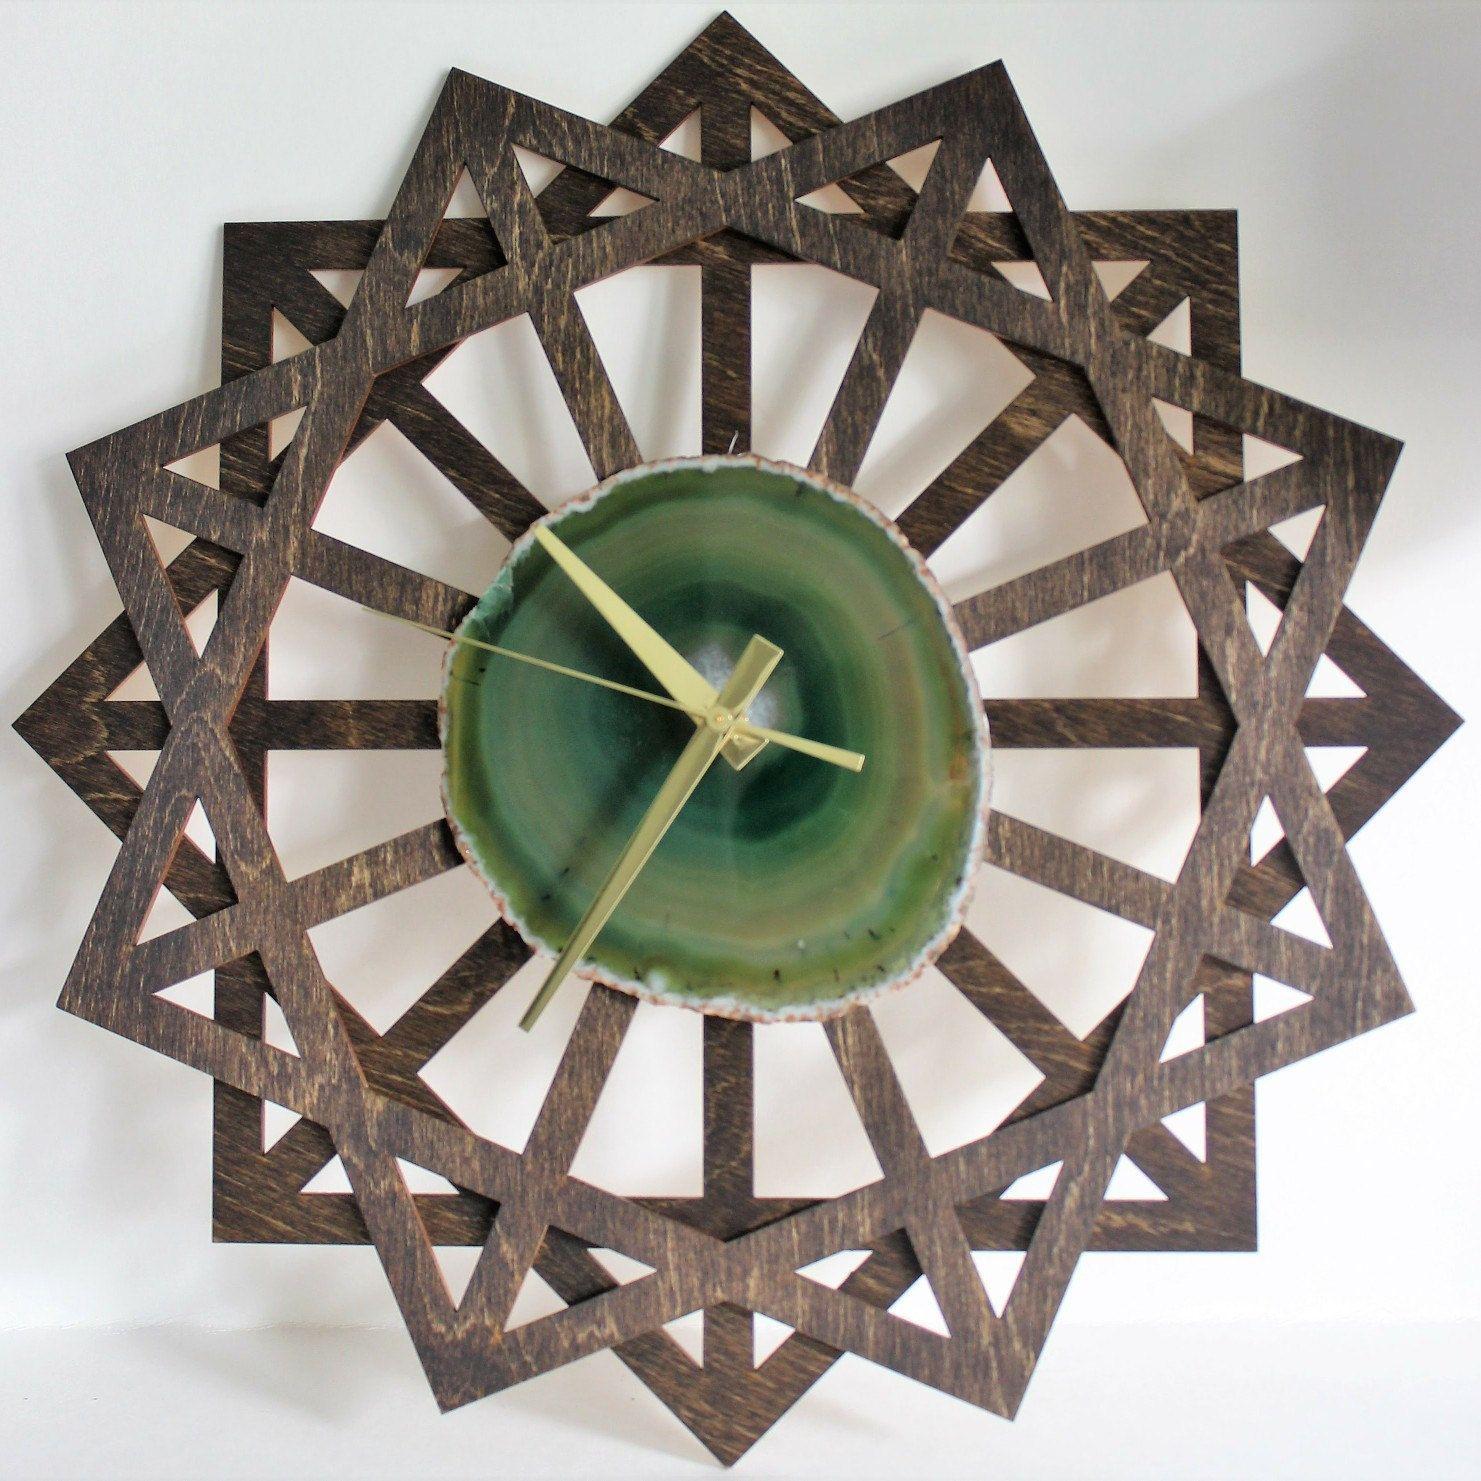 Superb HELLO Gorgeous Sunburst Green Agate Wall Clock!